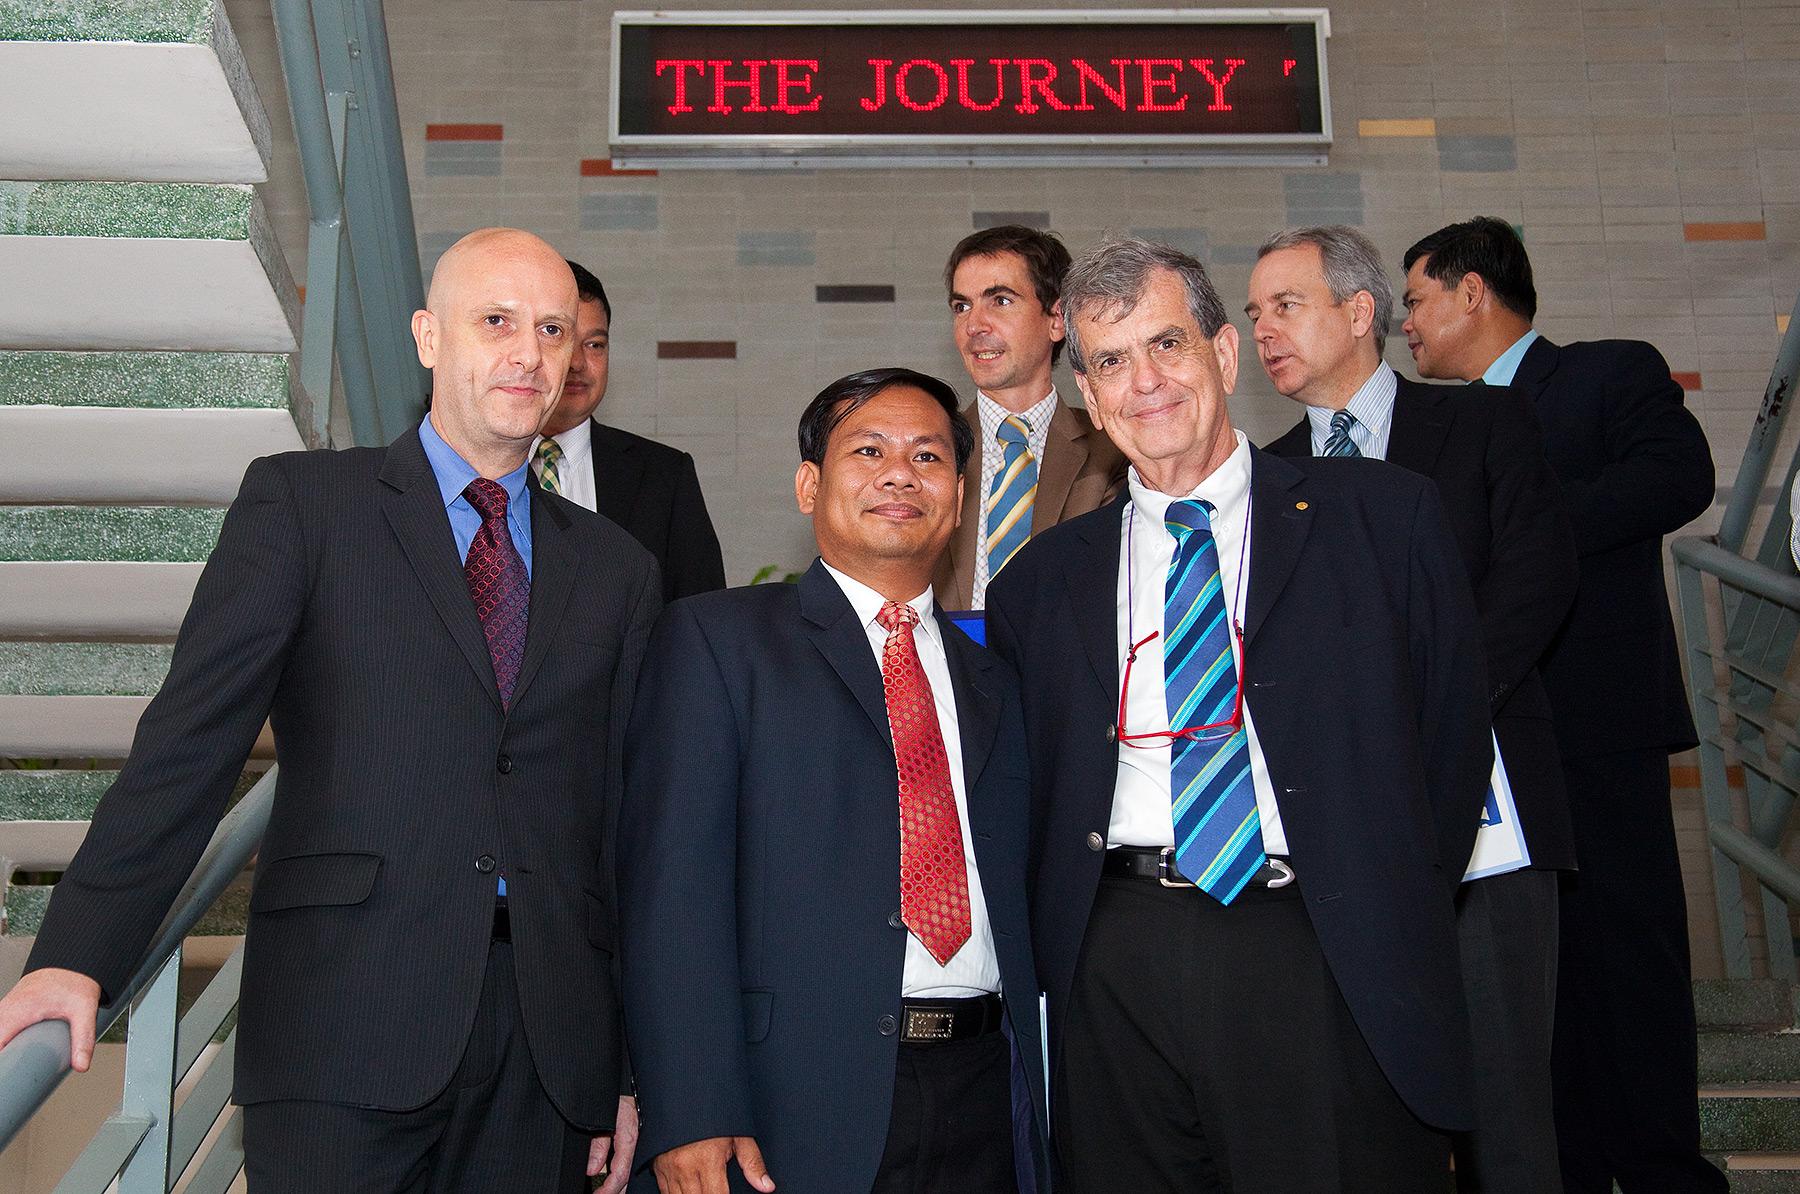 'Prof. Aaron J. Ciechanover, Uwe Morawetz Phnom Penh Royal University, Bridges, Int. Peace Foundation